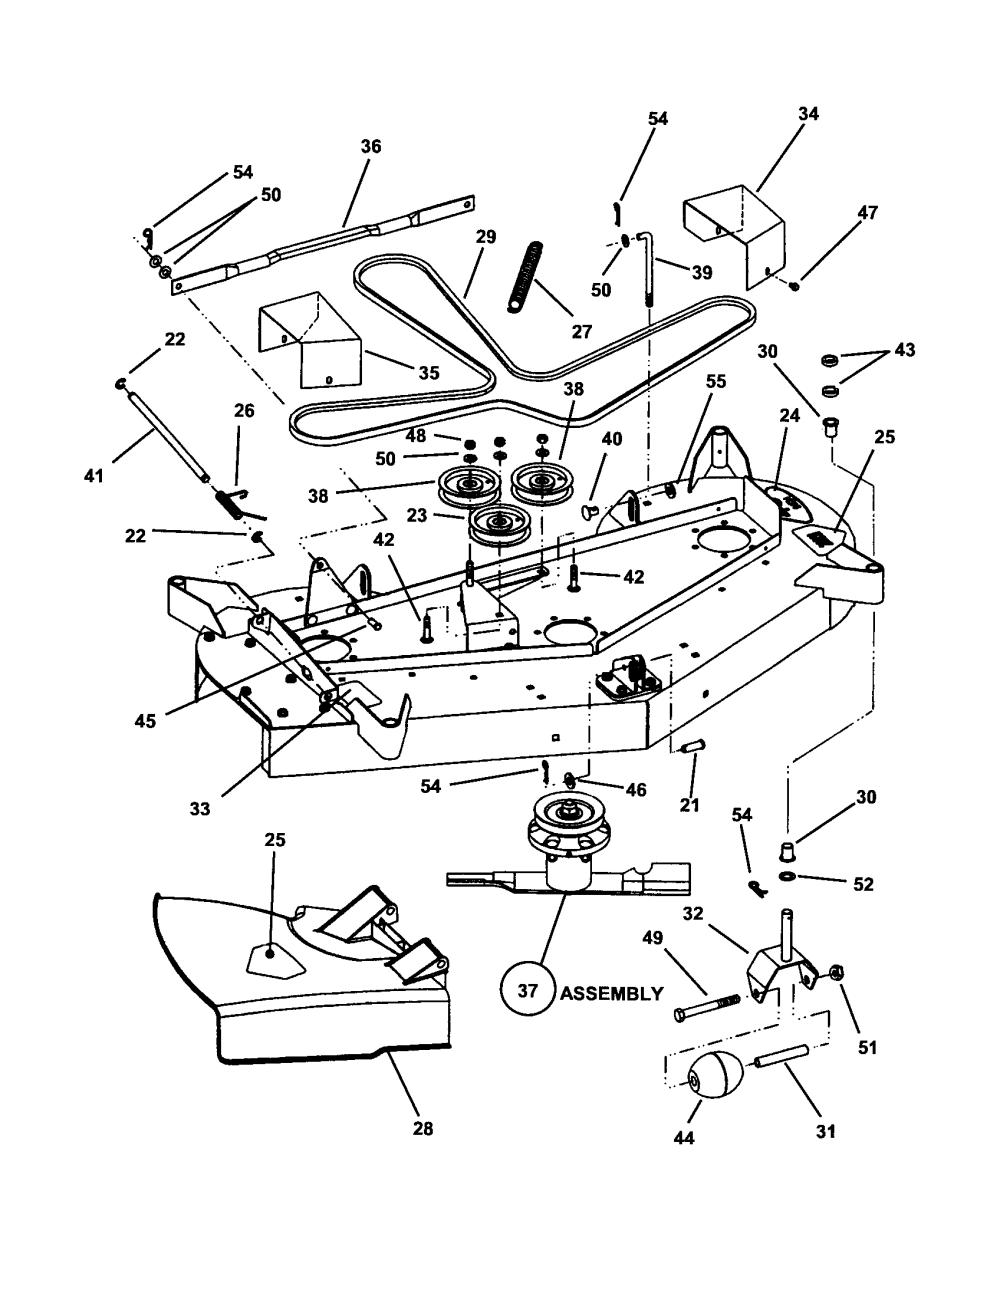 medium resolution of snapper hzs14331bve 48 mower deck diagram